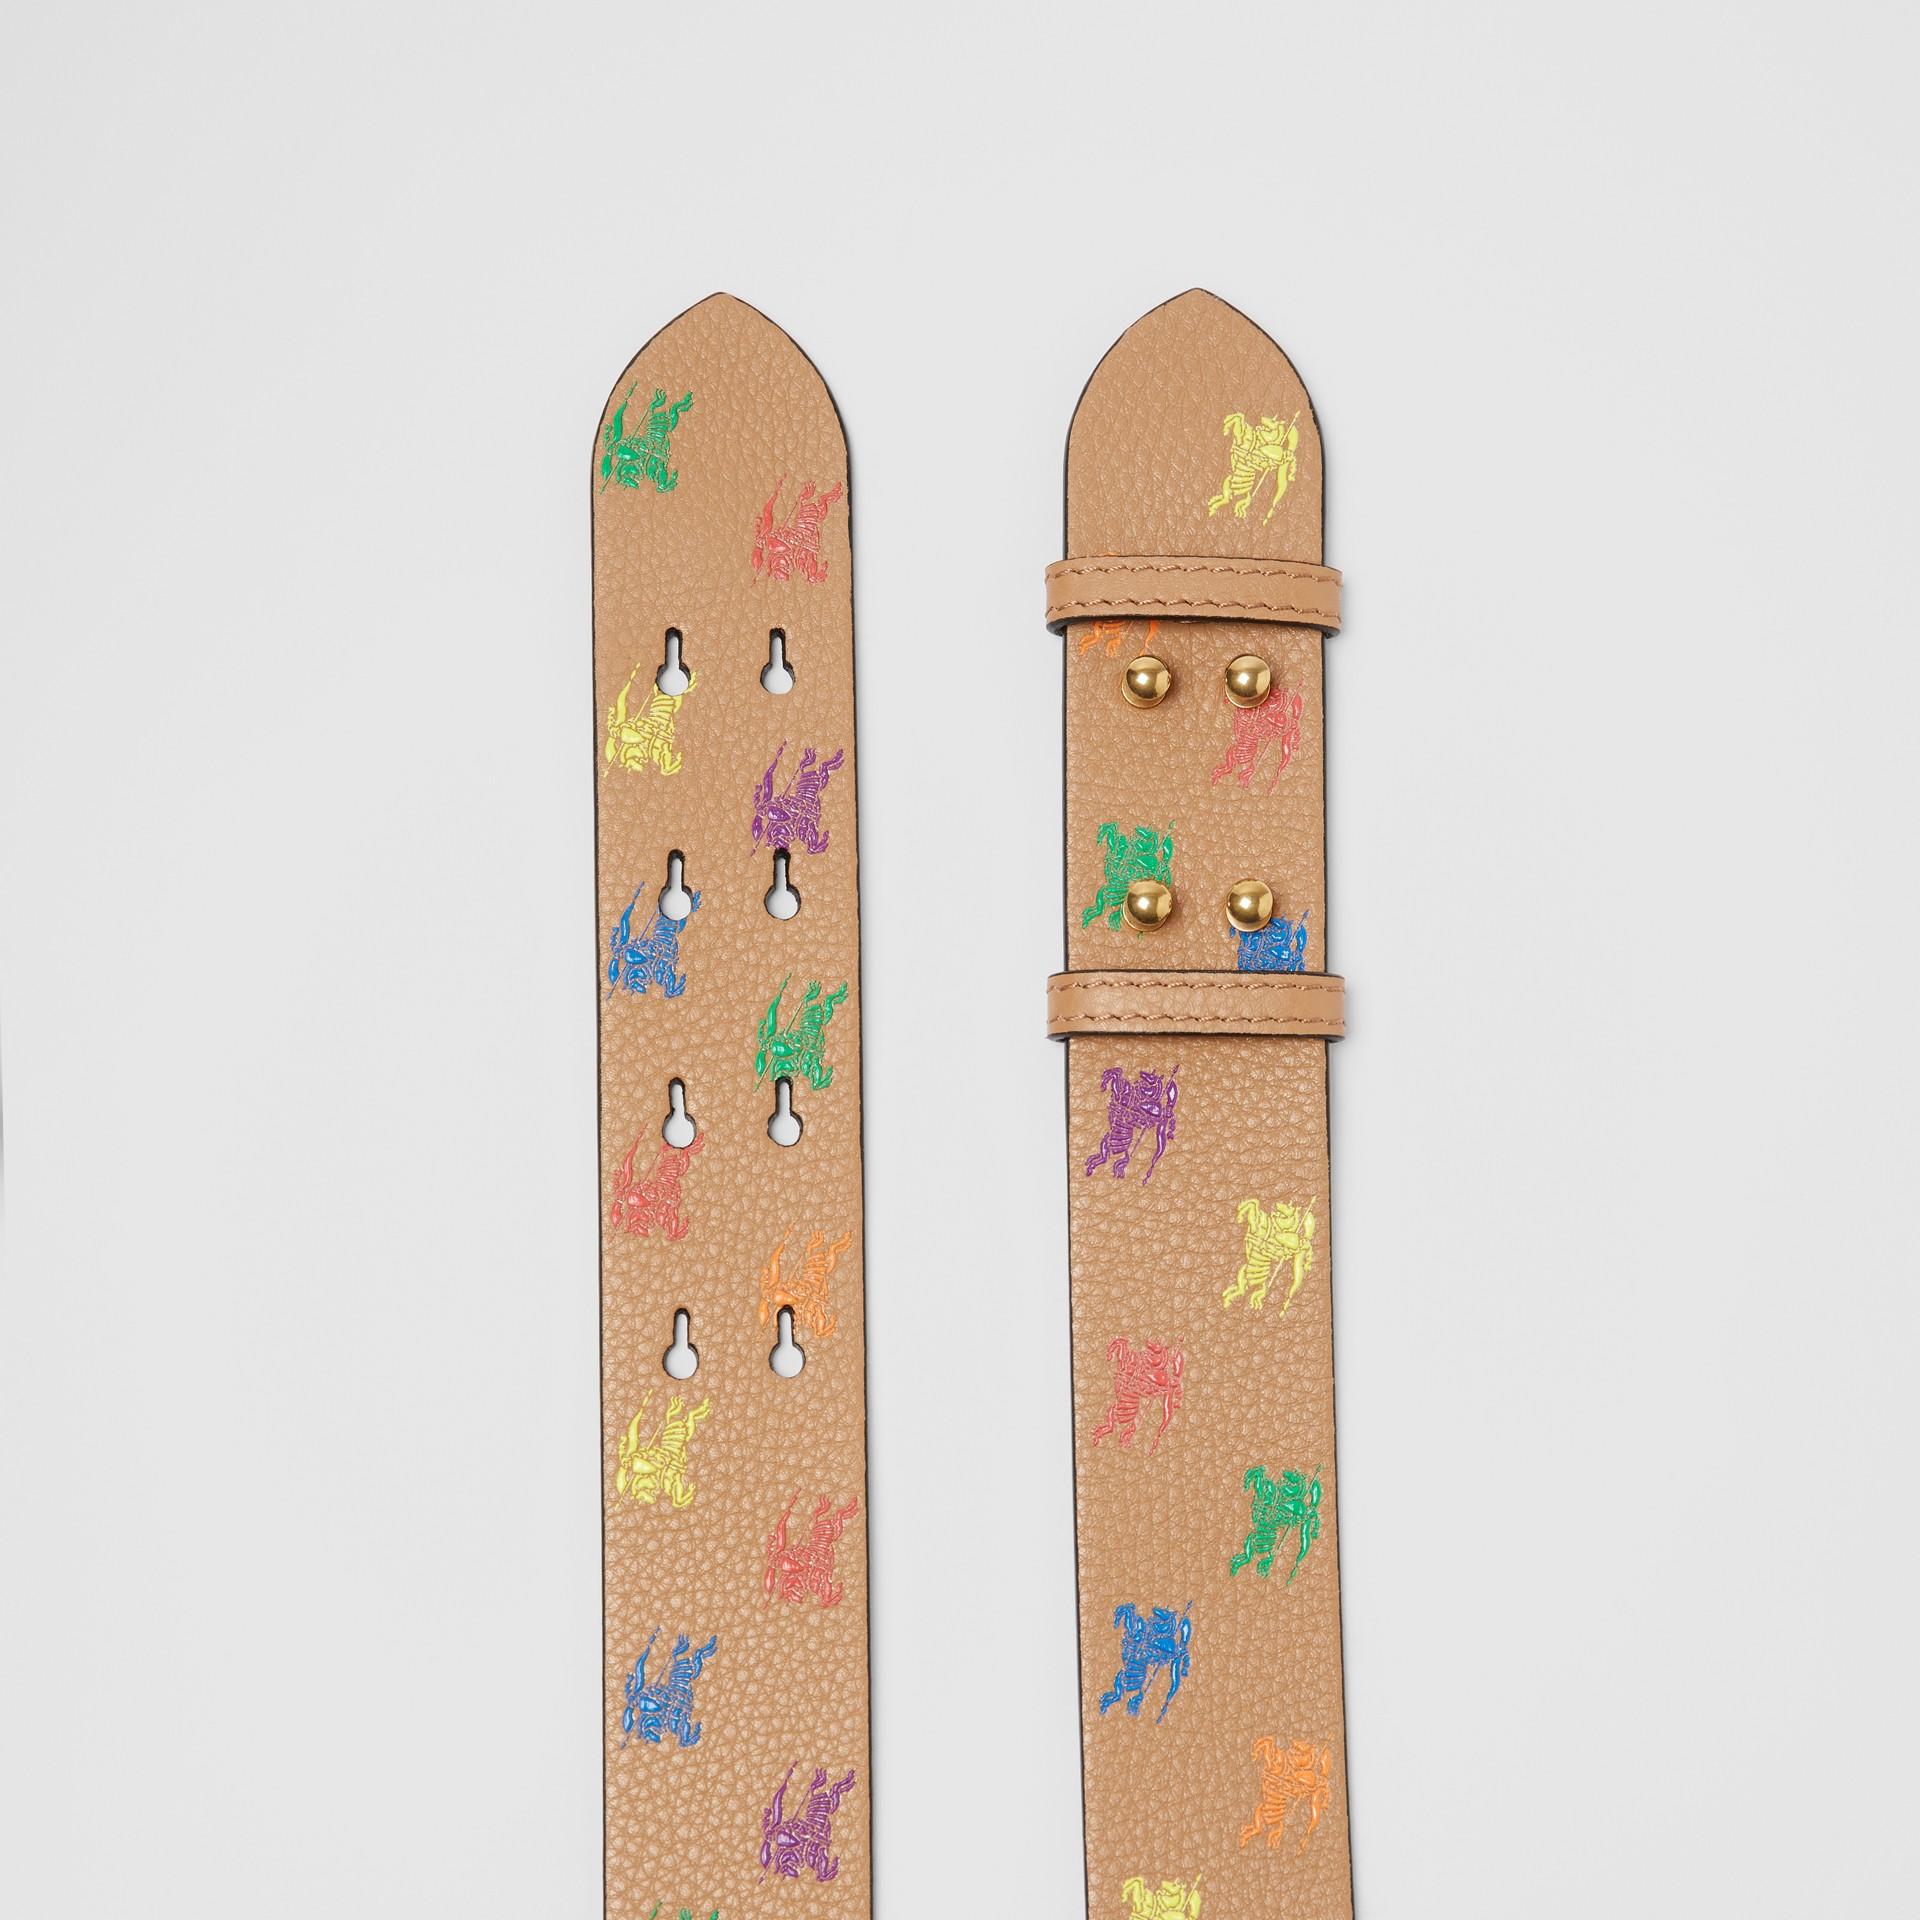 Ledergürtel mit Ritteremblem für The Medium Belt Bag (Helles Camelfarben) - Damen | Burberry - Galerie-Bild 2